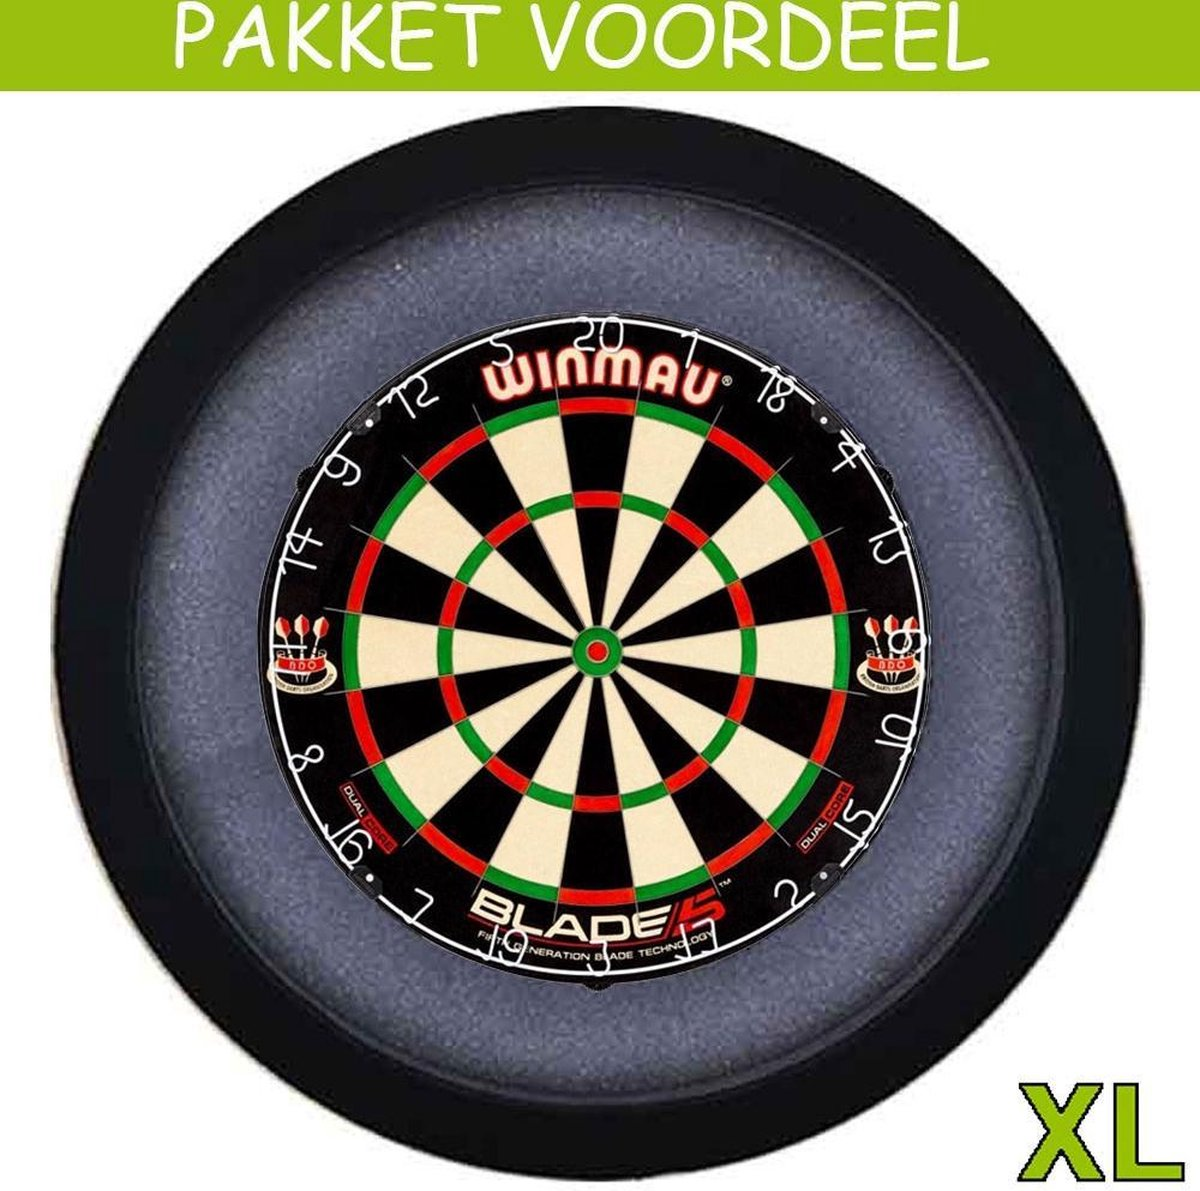 Dartbord Verlichting Voordeelpakket Pro + Dual Core + Dartbordverlichting Basic XL(Zwart)